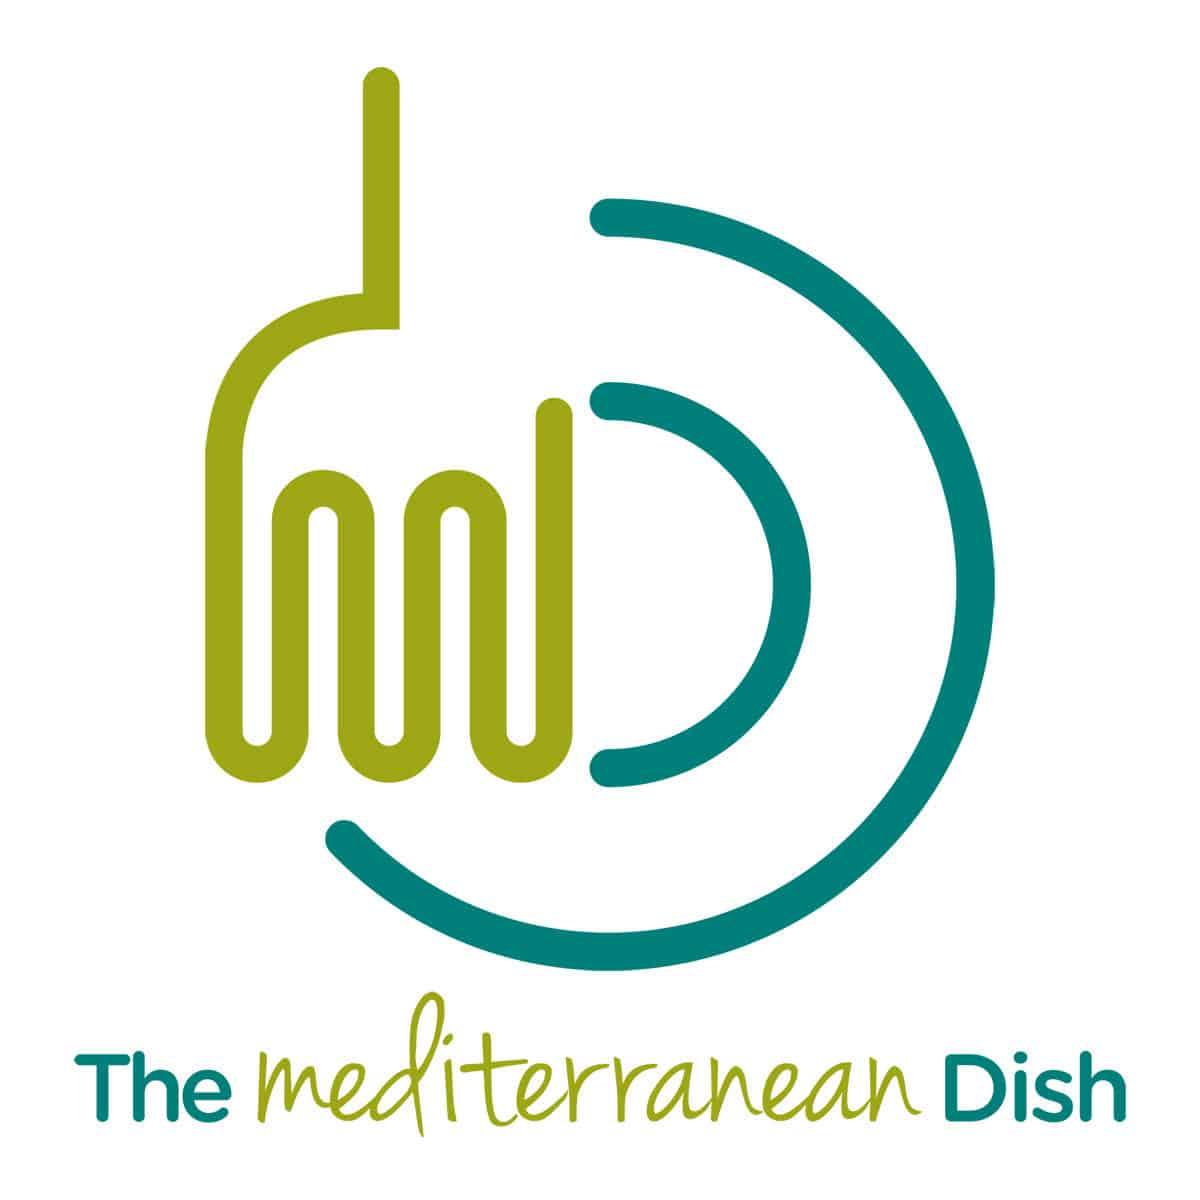 Mediterranean Recipes & Lifestyle | The Mediterranean Dish